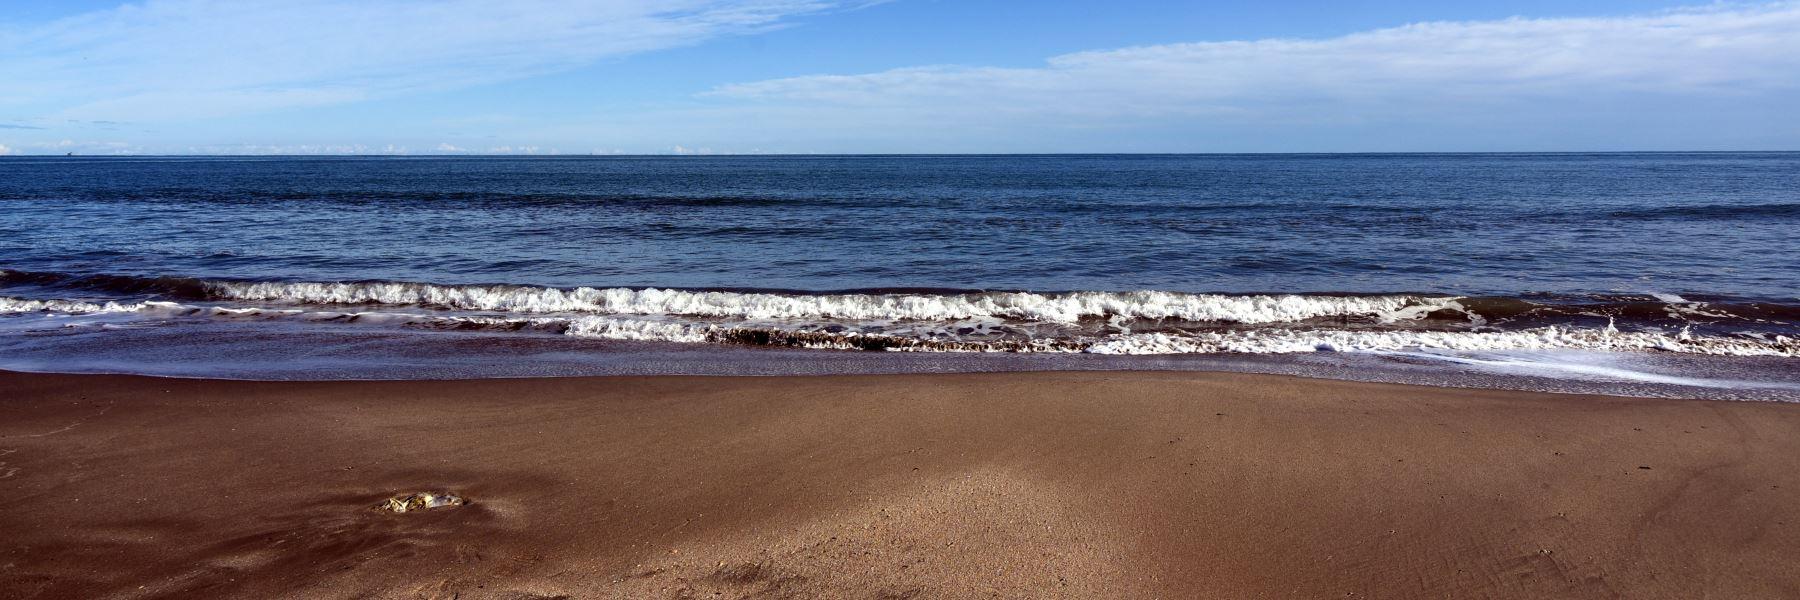 Mare d'inverno  - FR